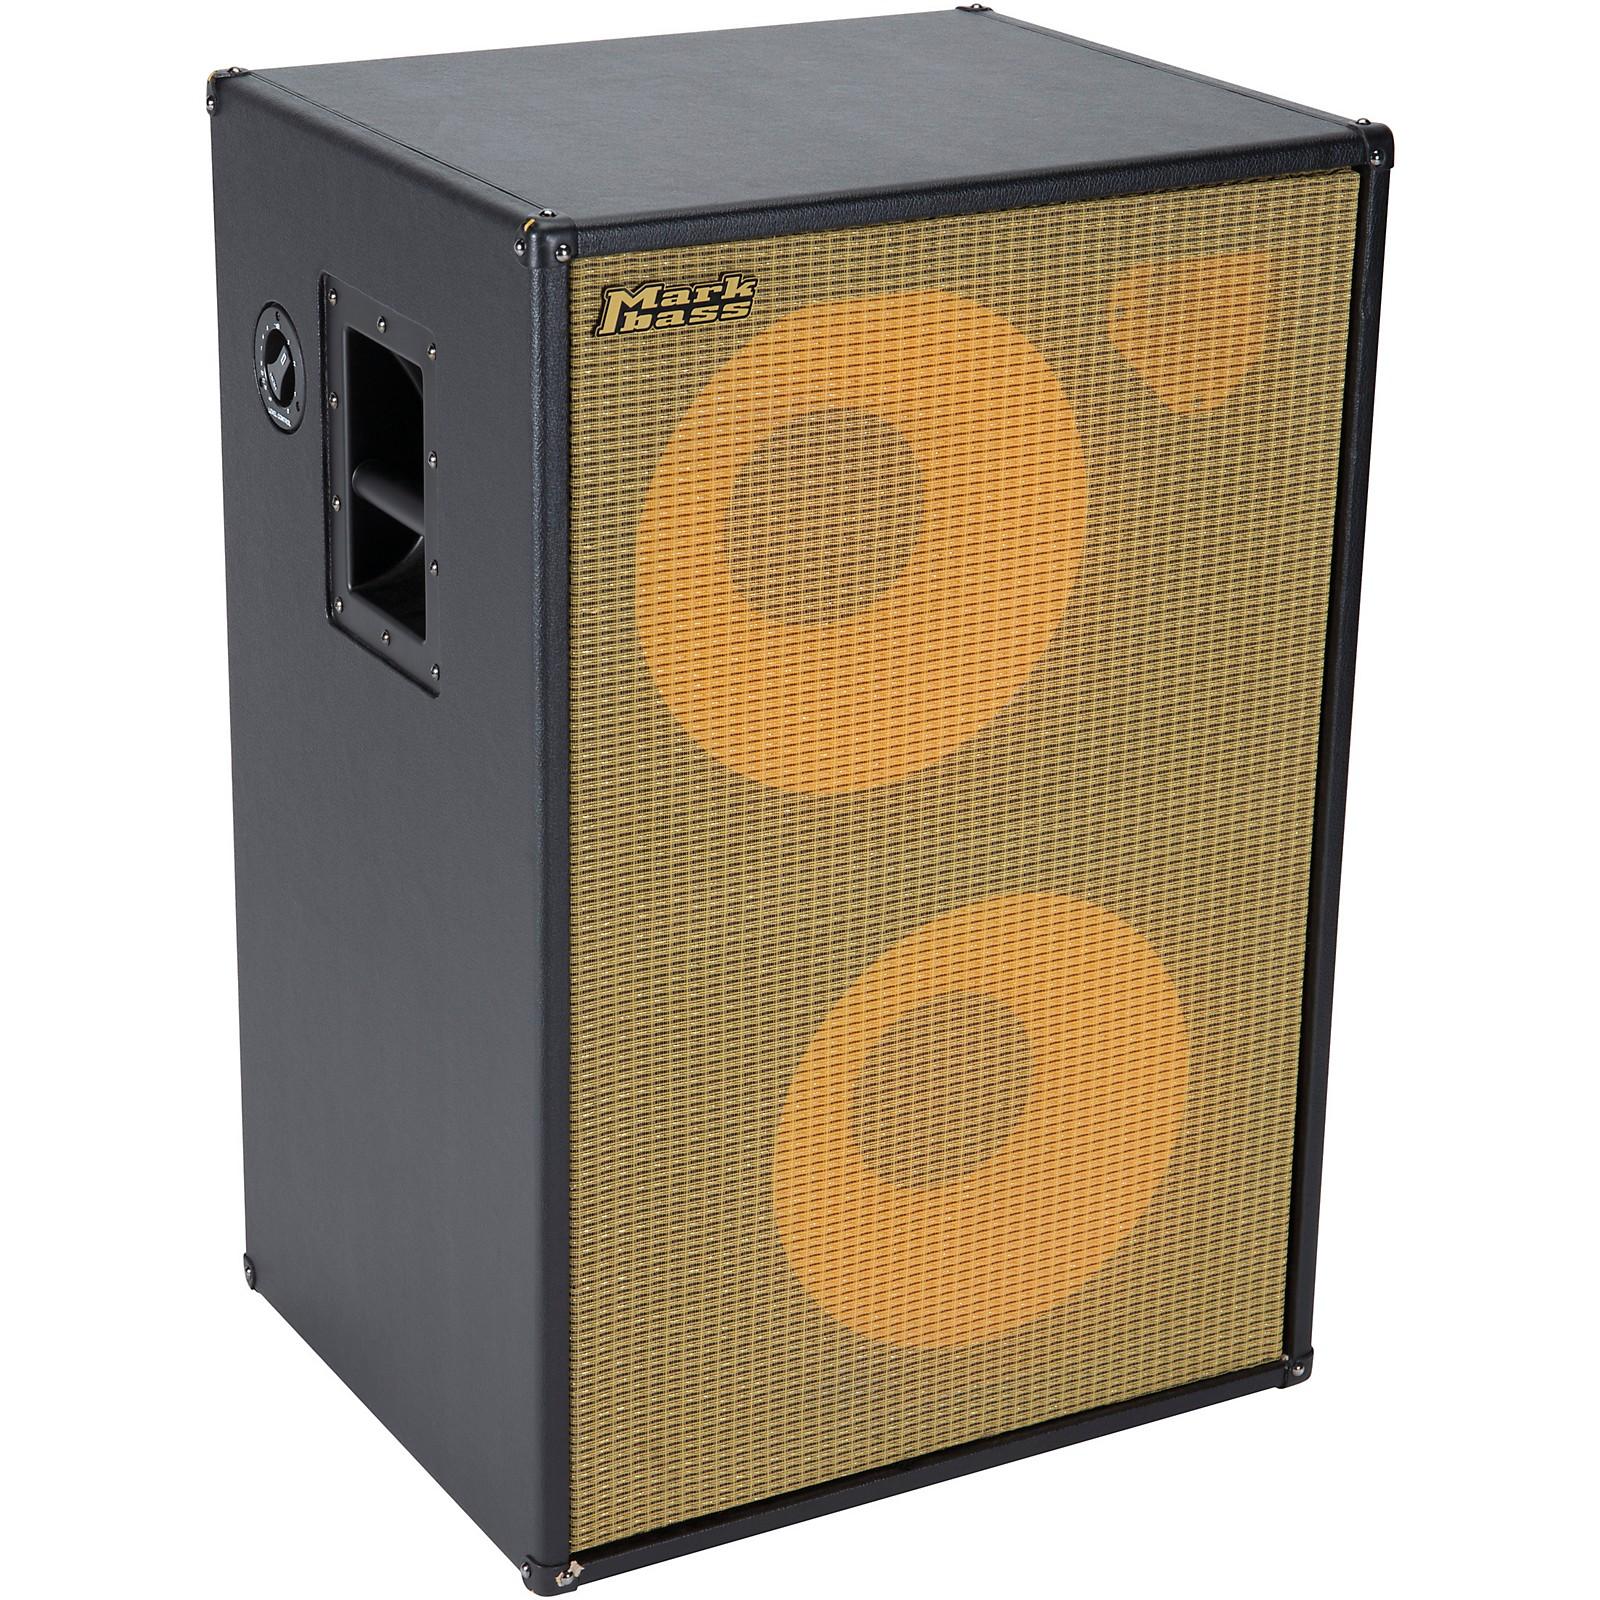 Markbass Classic 152 SH 800W 2x15 Bass Speaker Cabinet